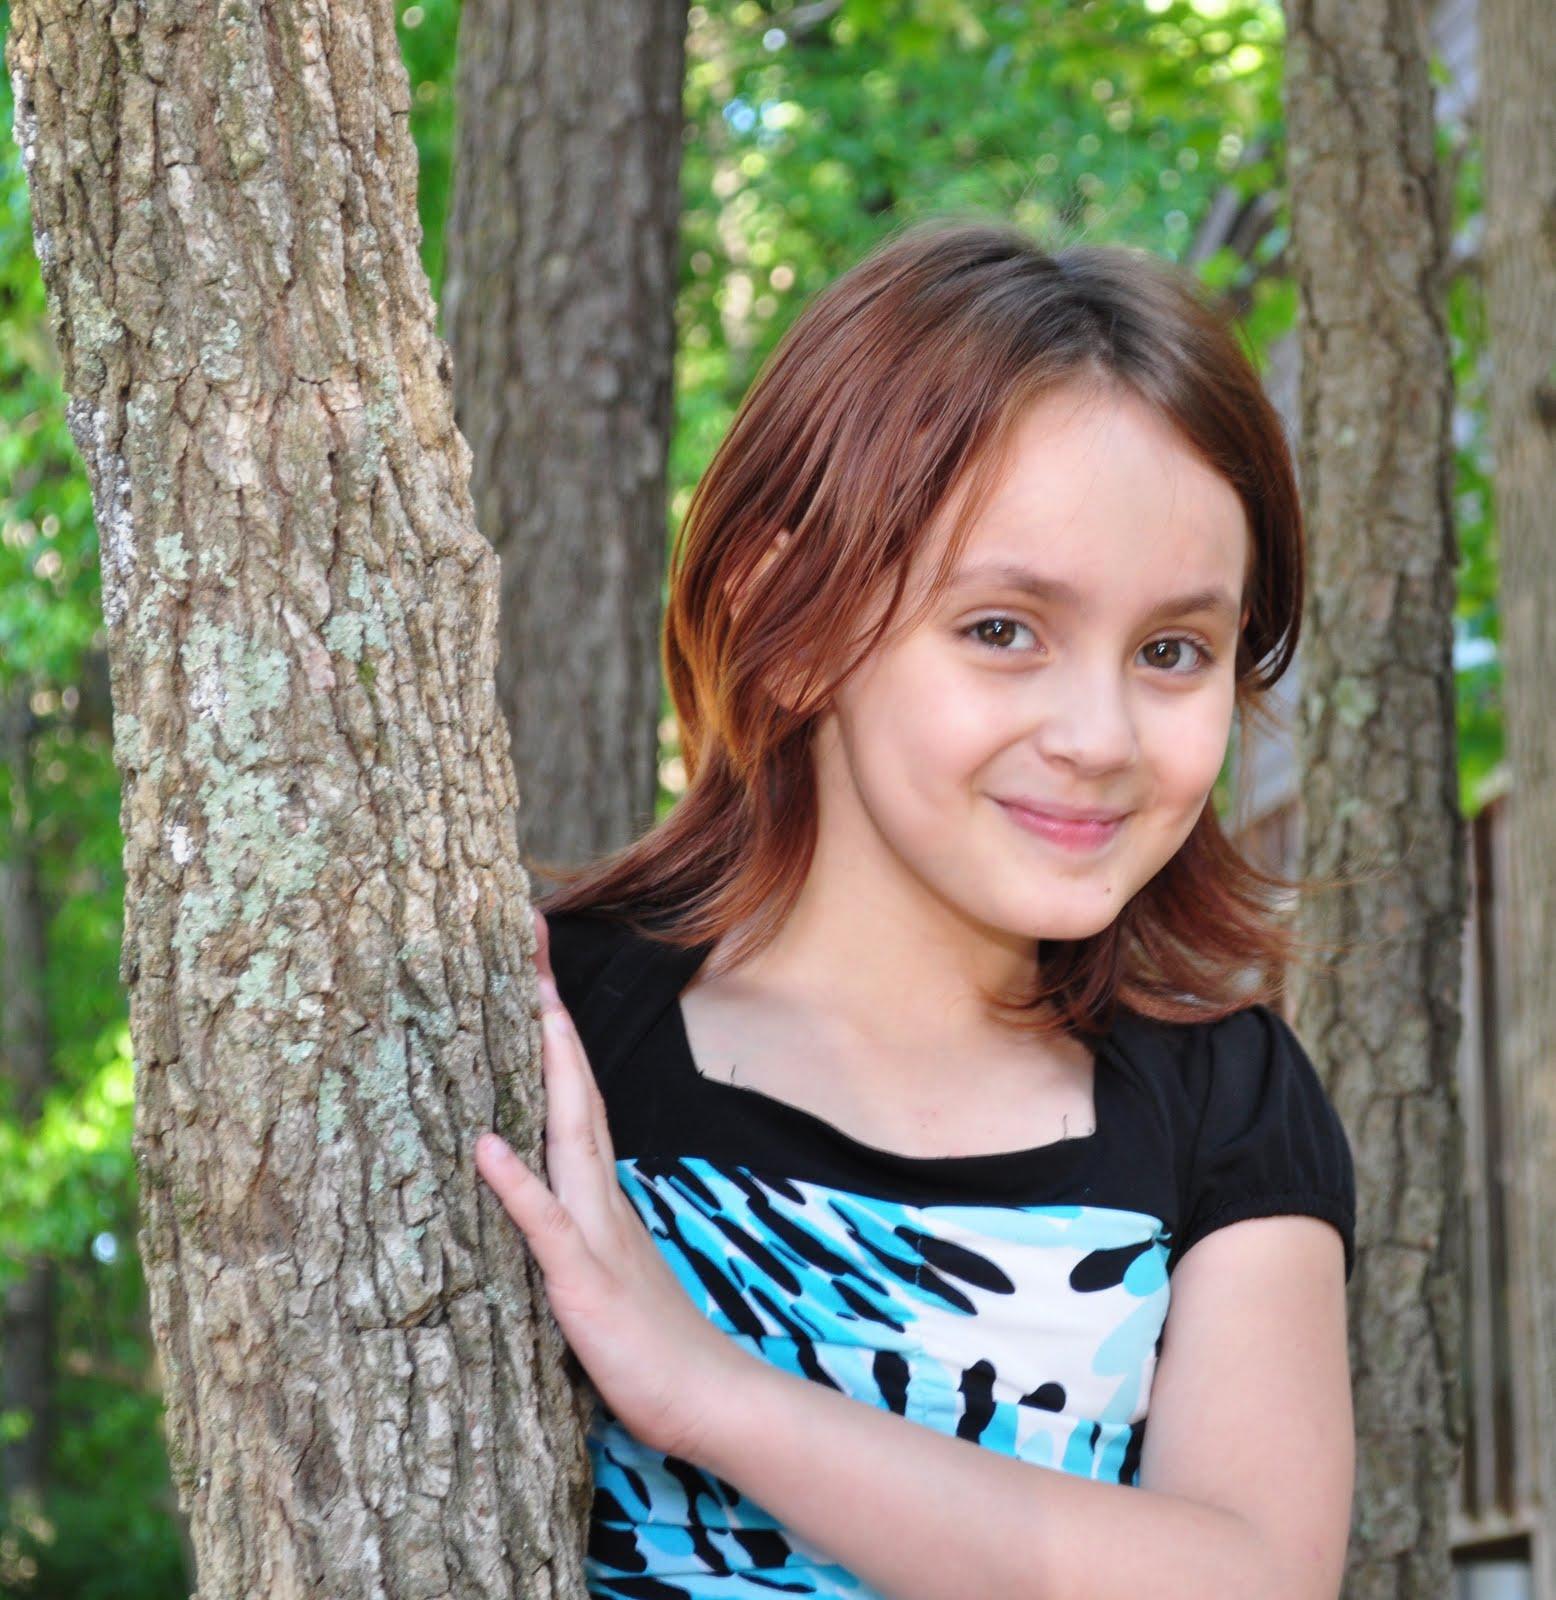 Young nn girl model #13